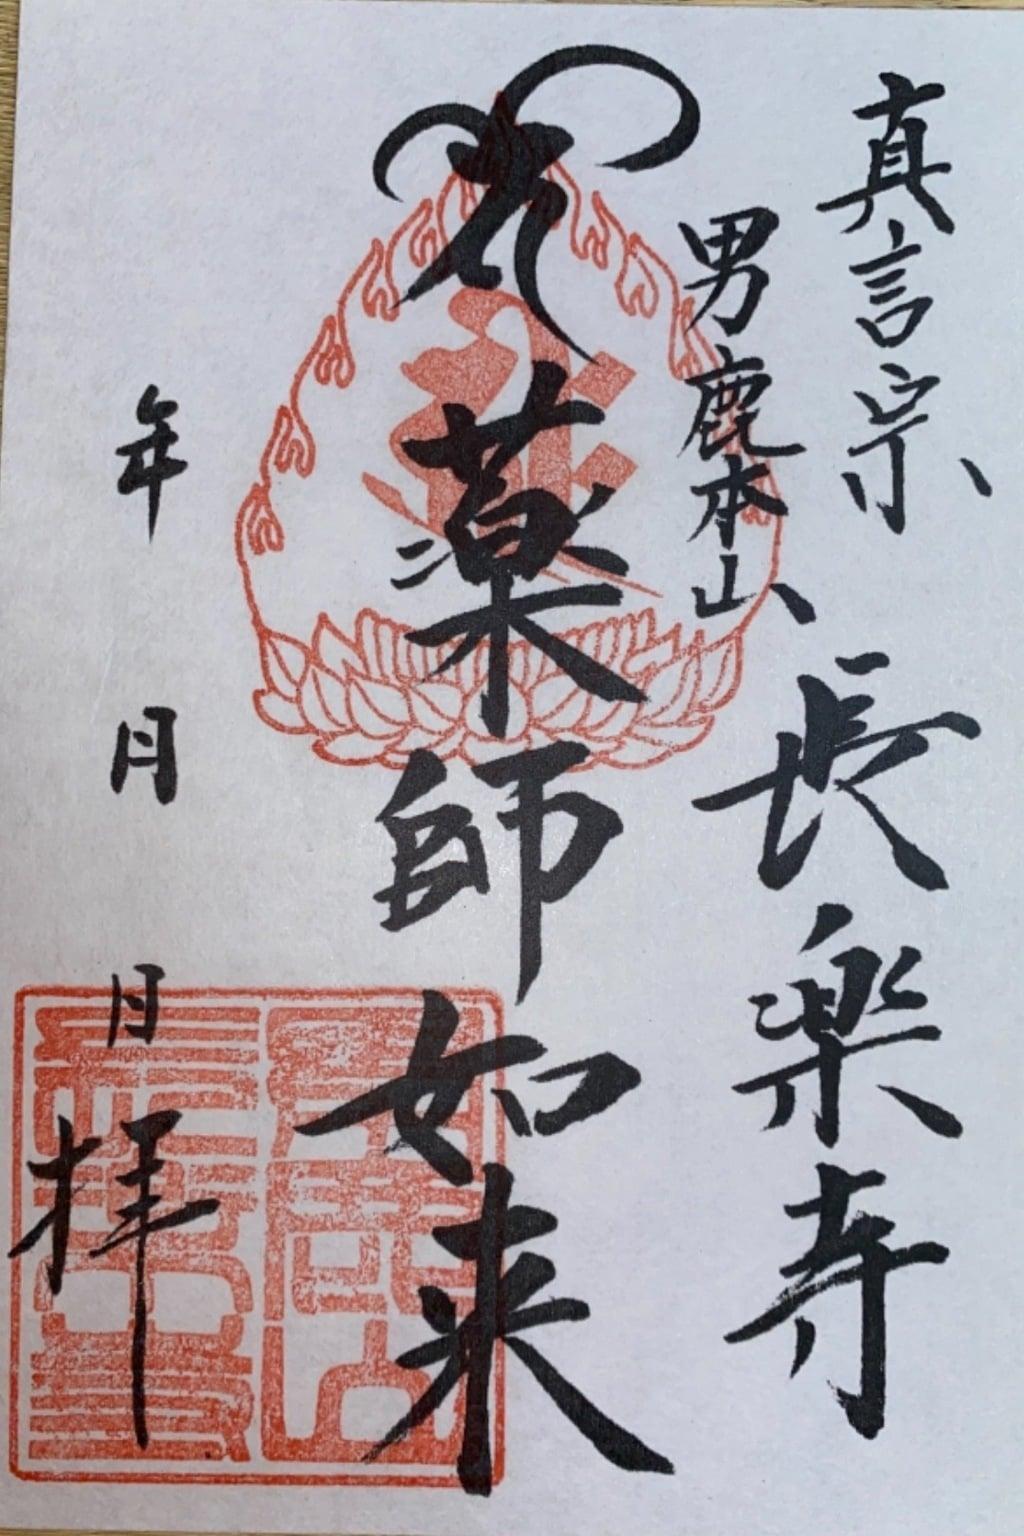 長樂寺の御朱印